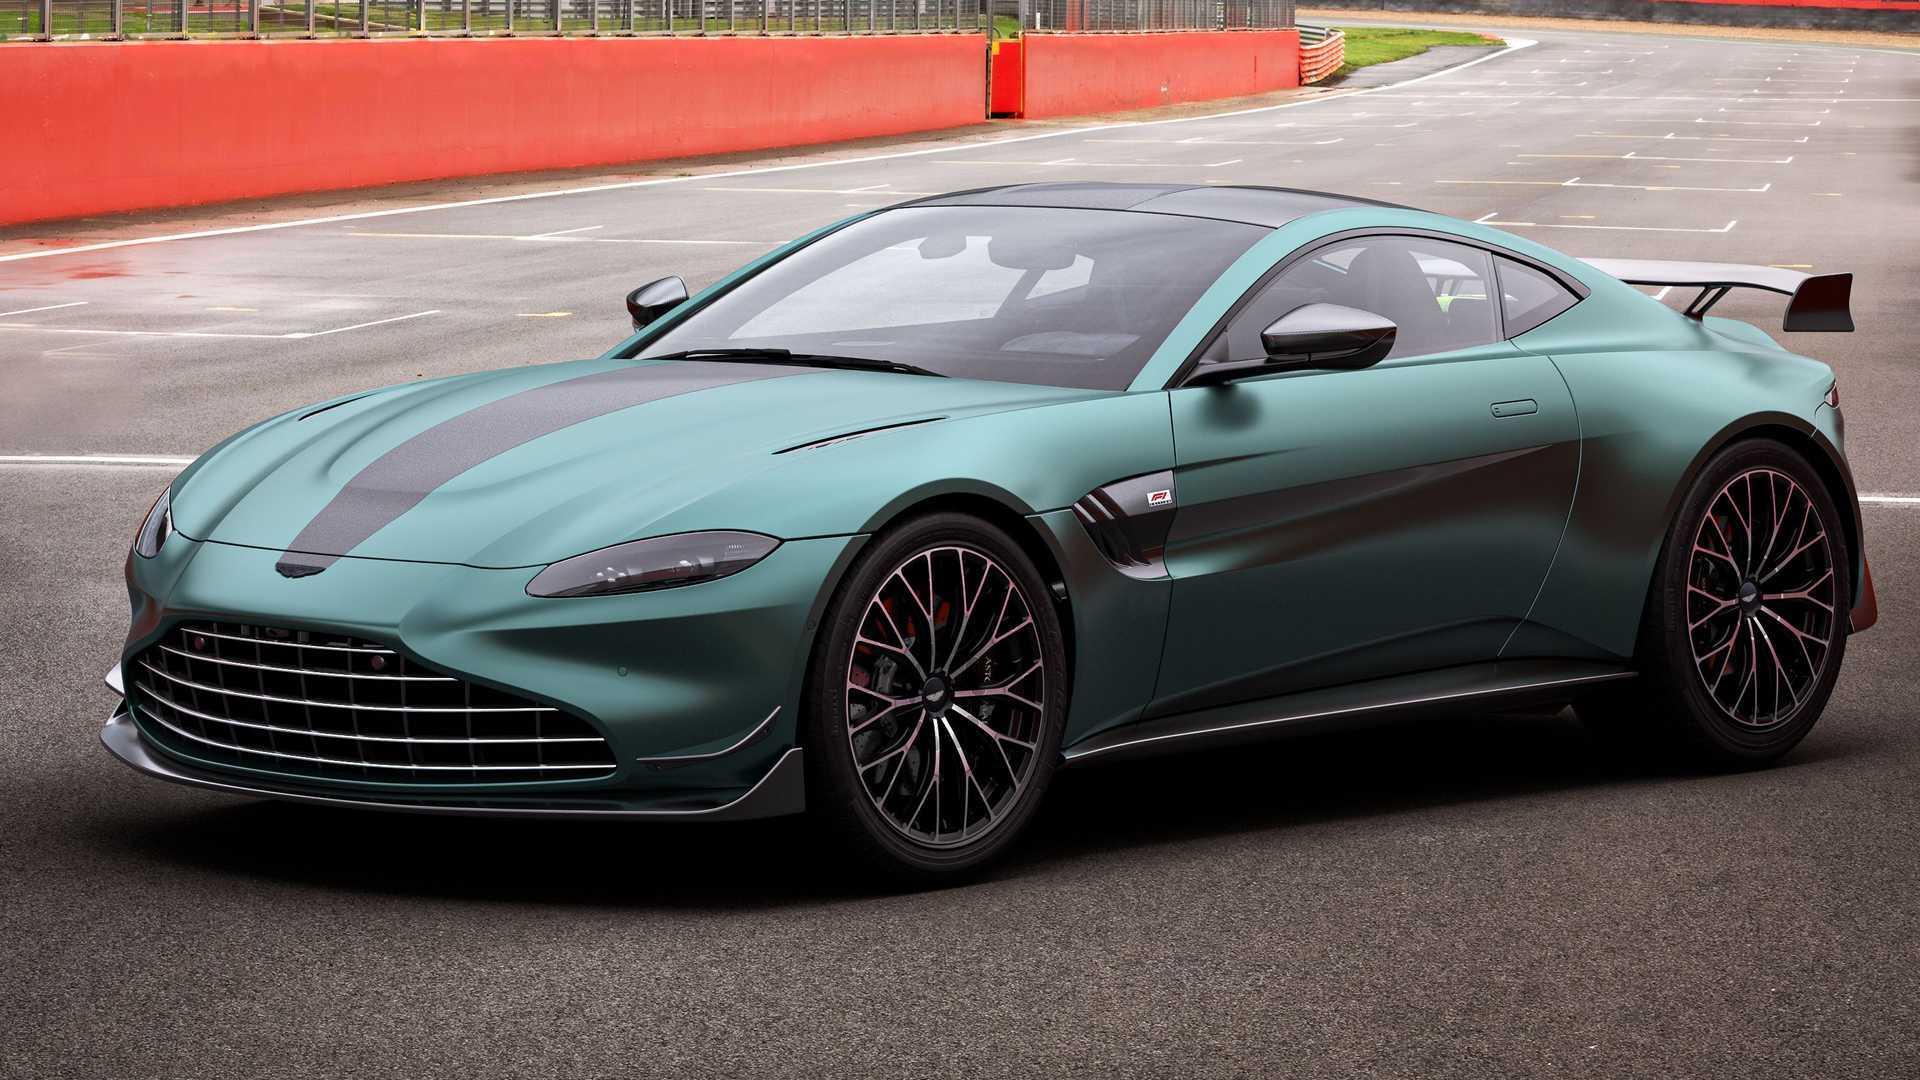 Aston Martin Vantage F1 Edition Debuts With More Power Aero Upgrades